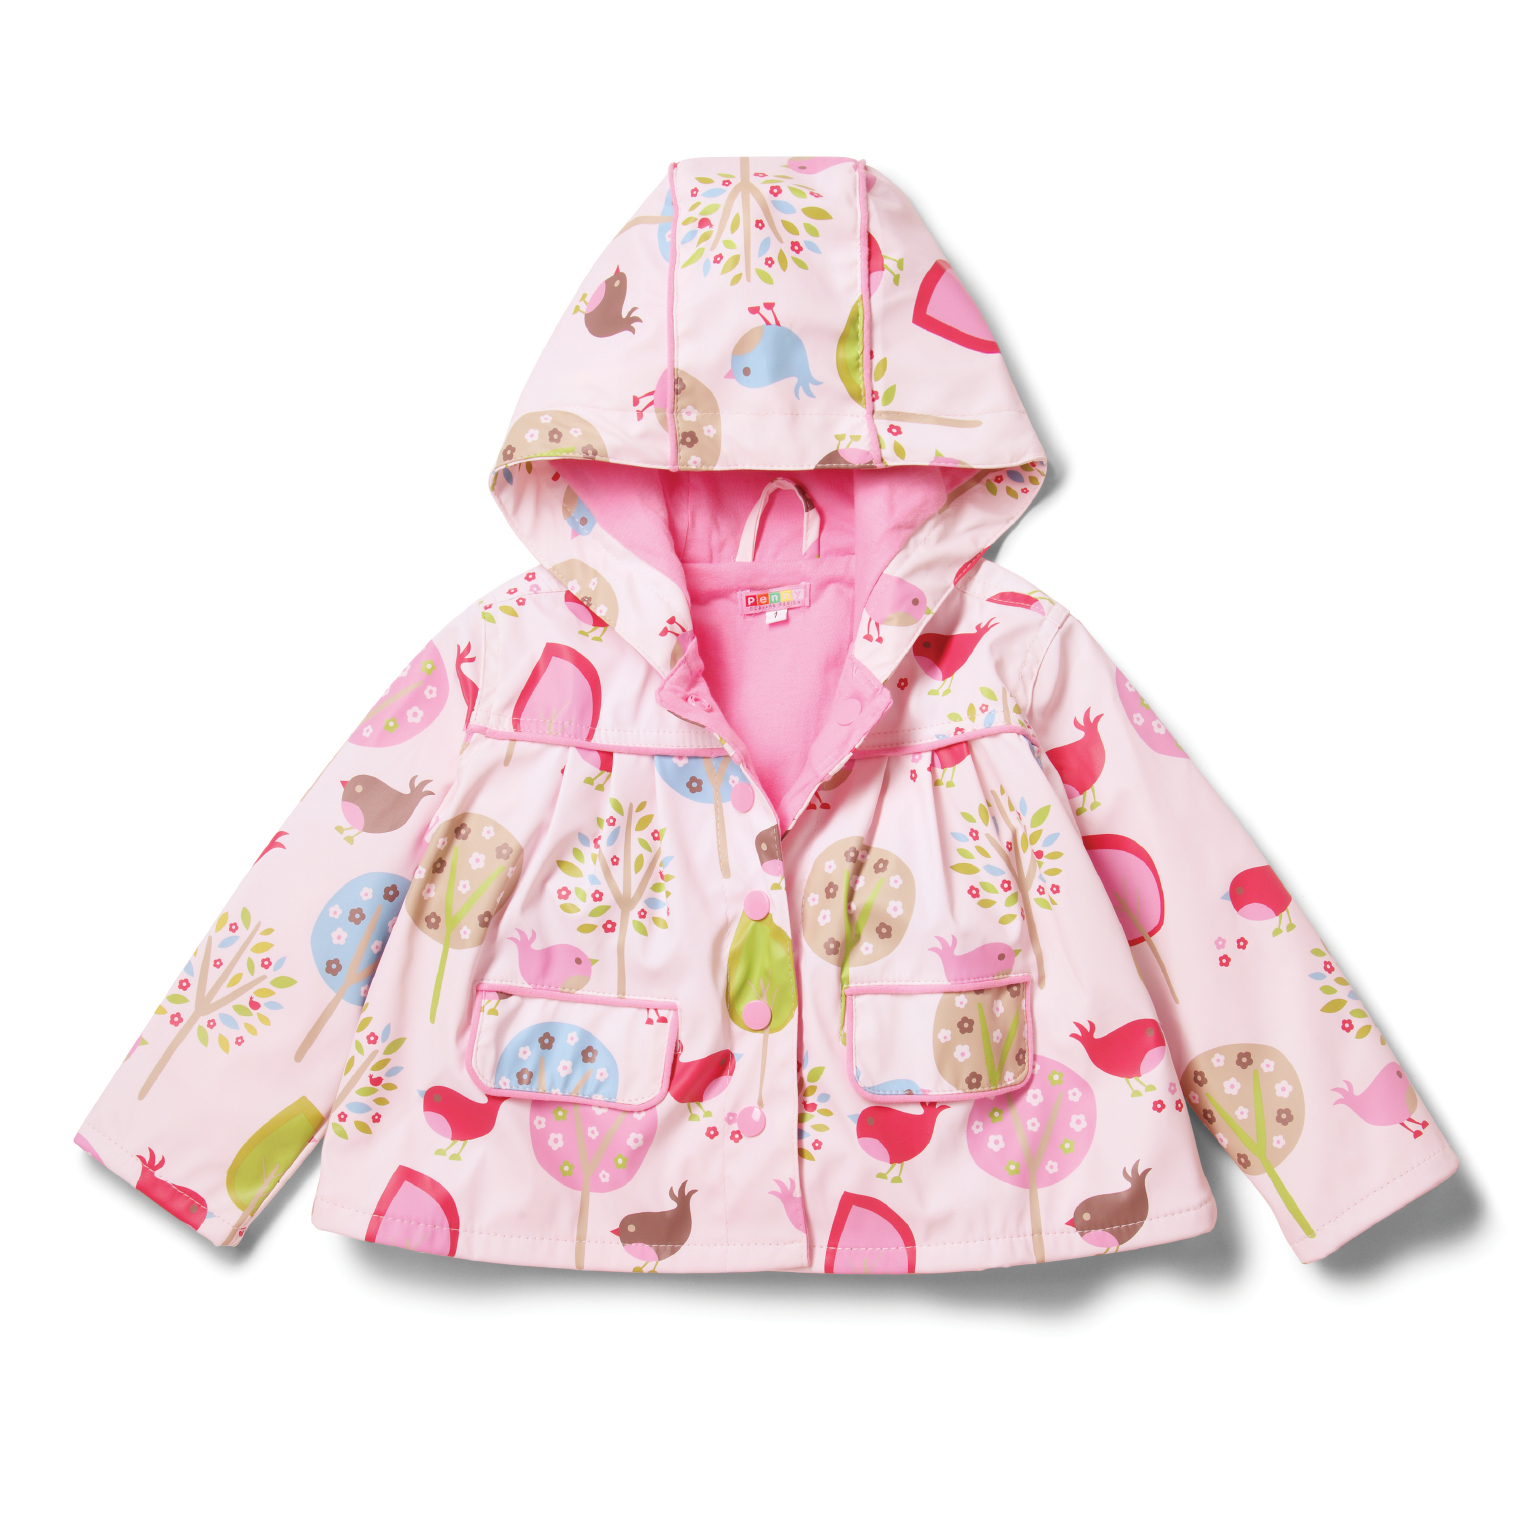 Raincoat Chirpy Bird - Size 1-2 image